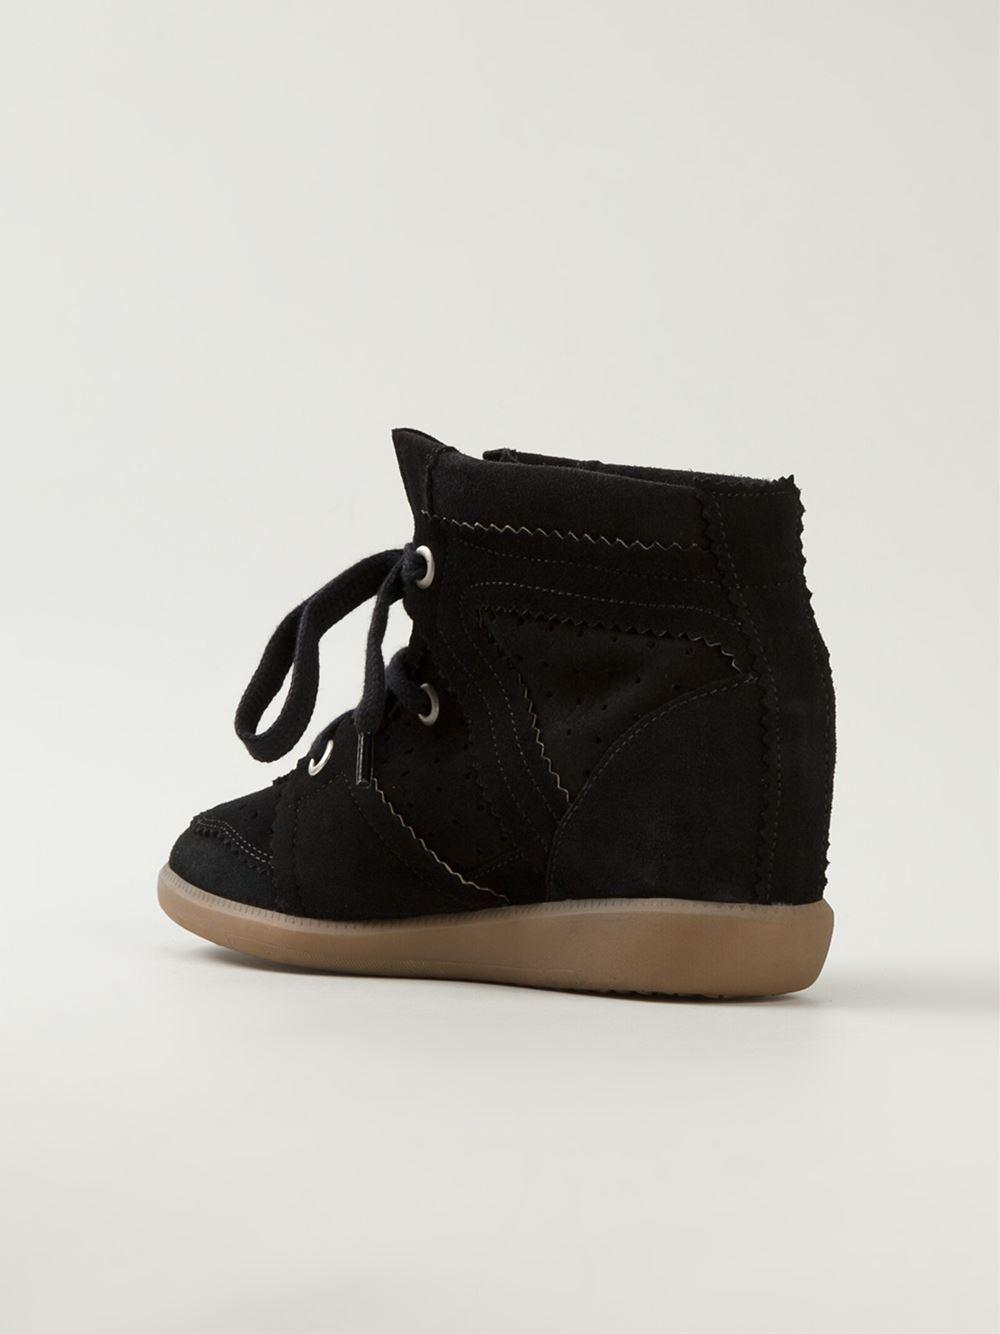 isabel marant toile 39 bobby 39 sneakers in black lyst. Black Bedroom Furniture Sets. Home Design Ideas